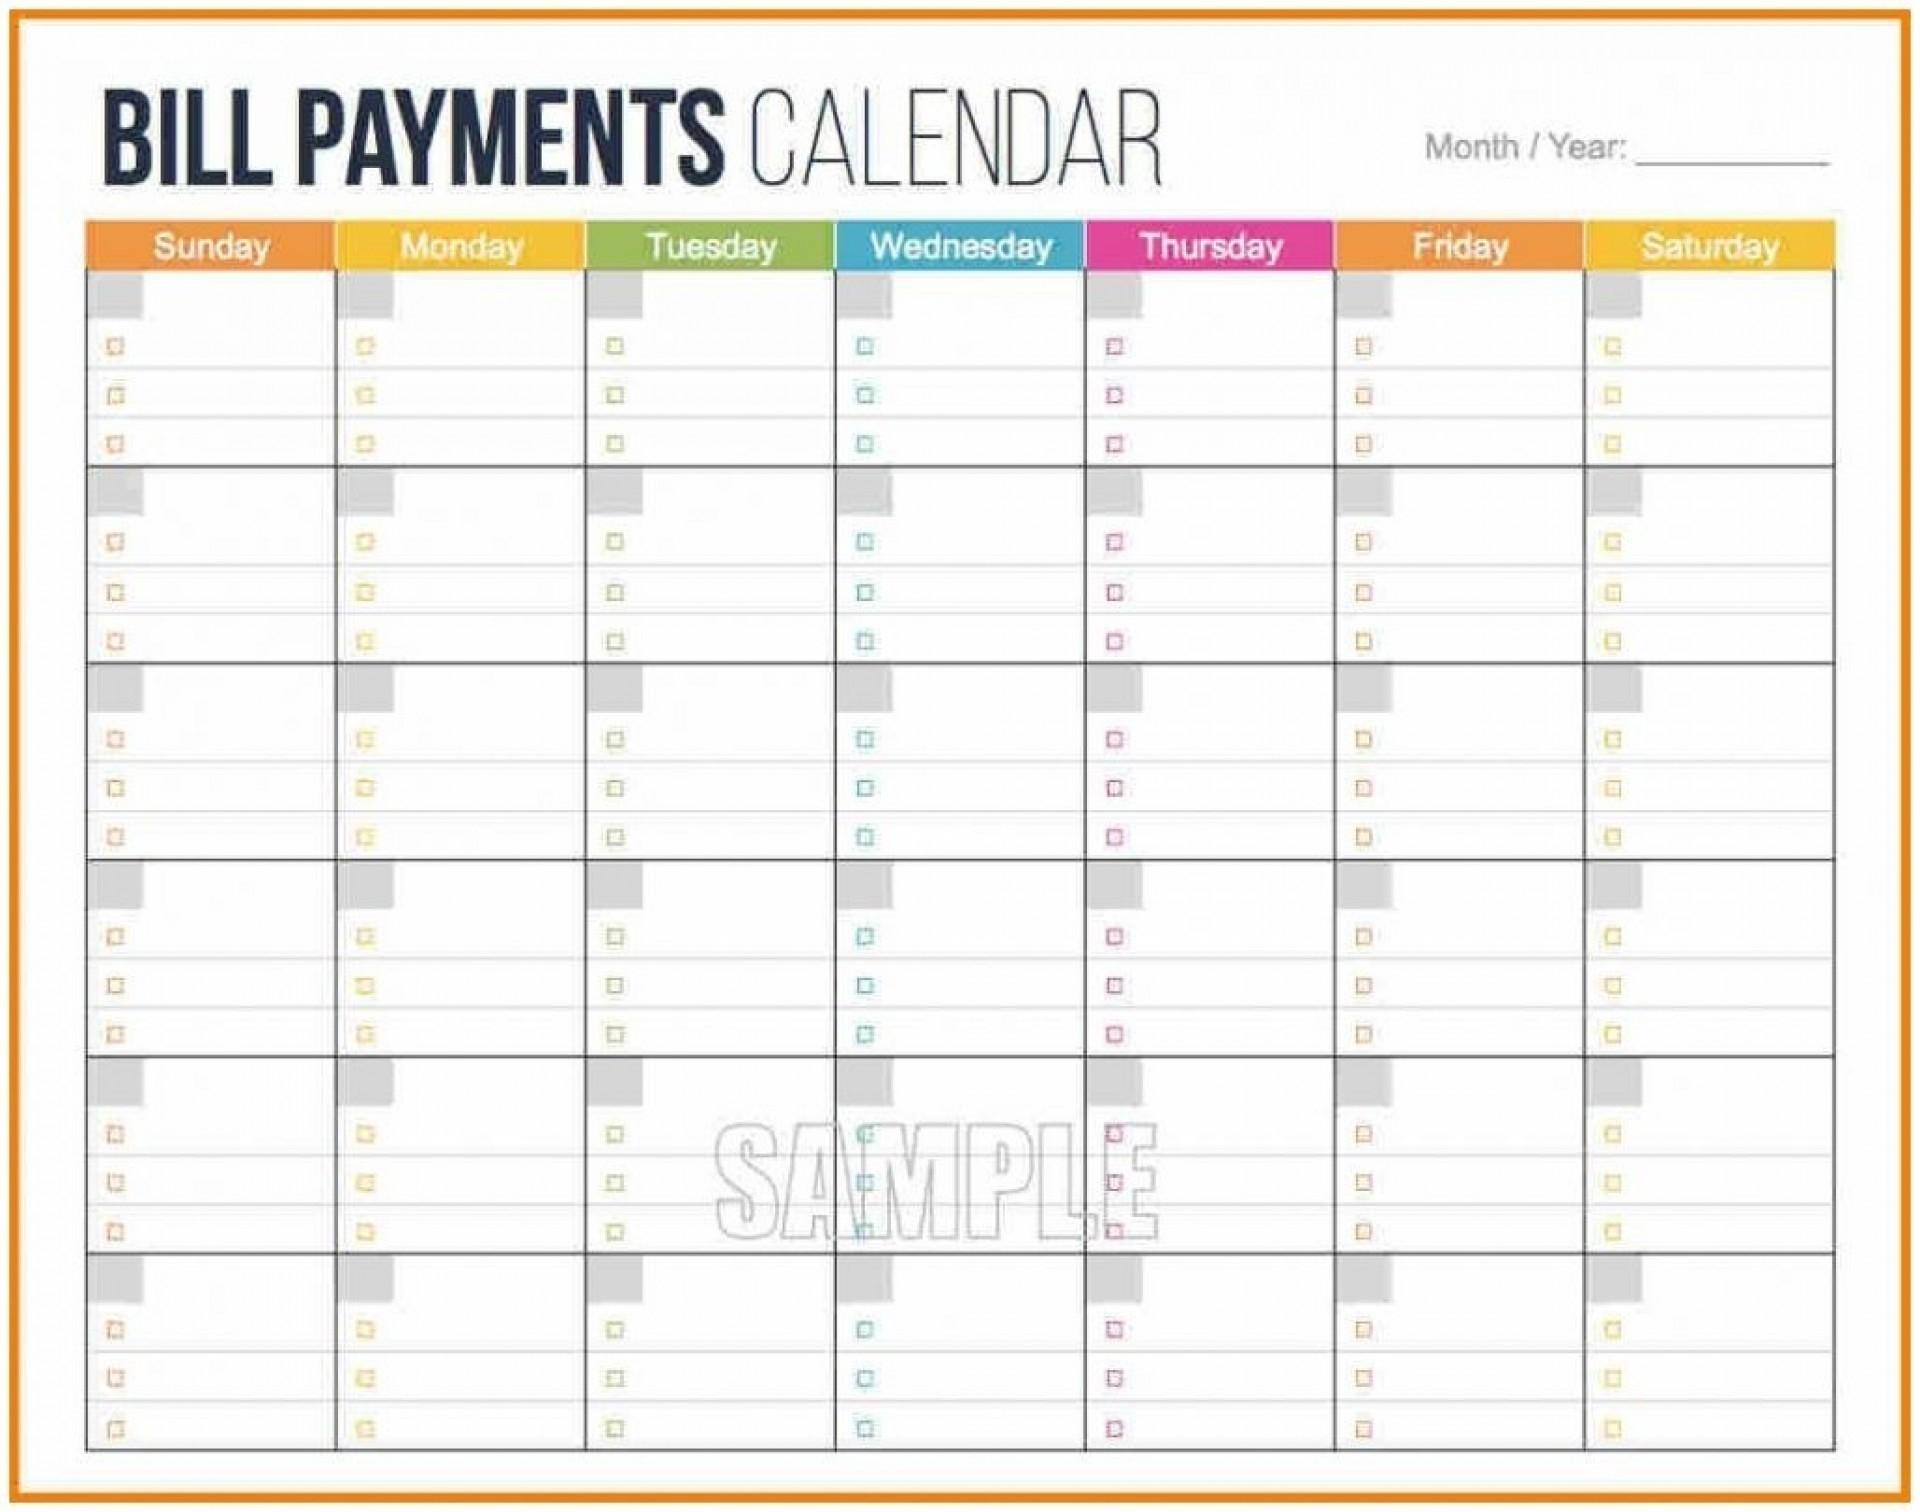 003 Bill Pay Calendar Template Ideas Paying Free Printable-Printable Bill Calendar 2020 Monthly